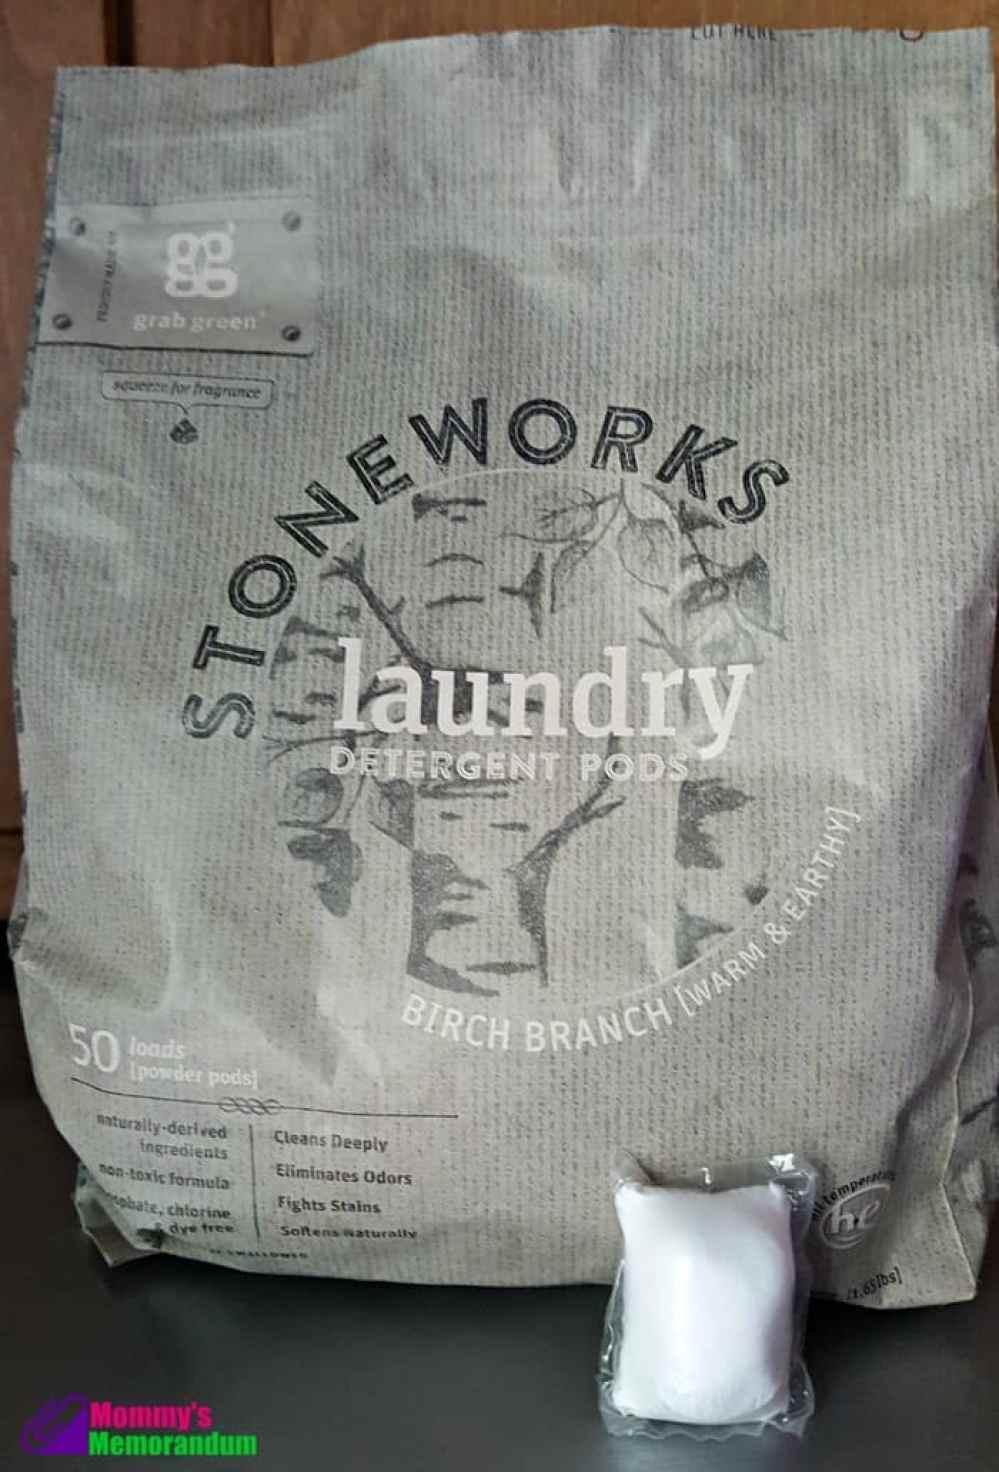 grab green birch branch laundry detergent pods